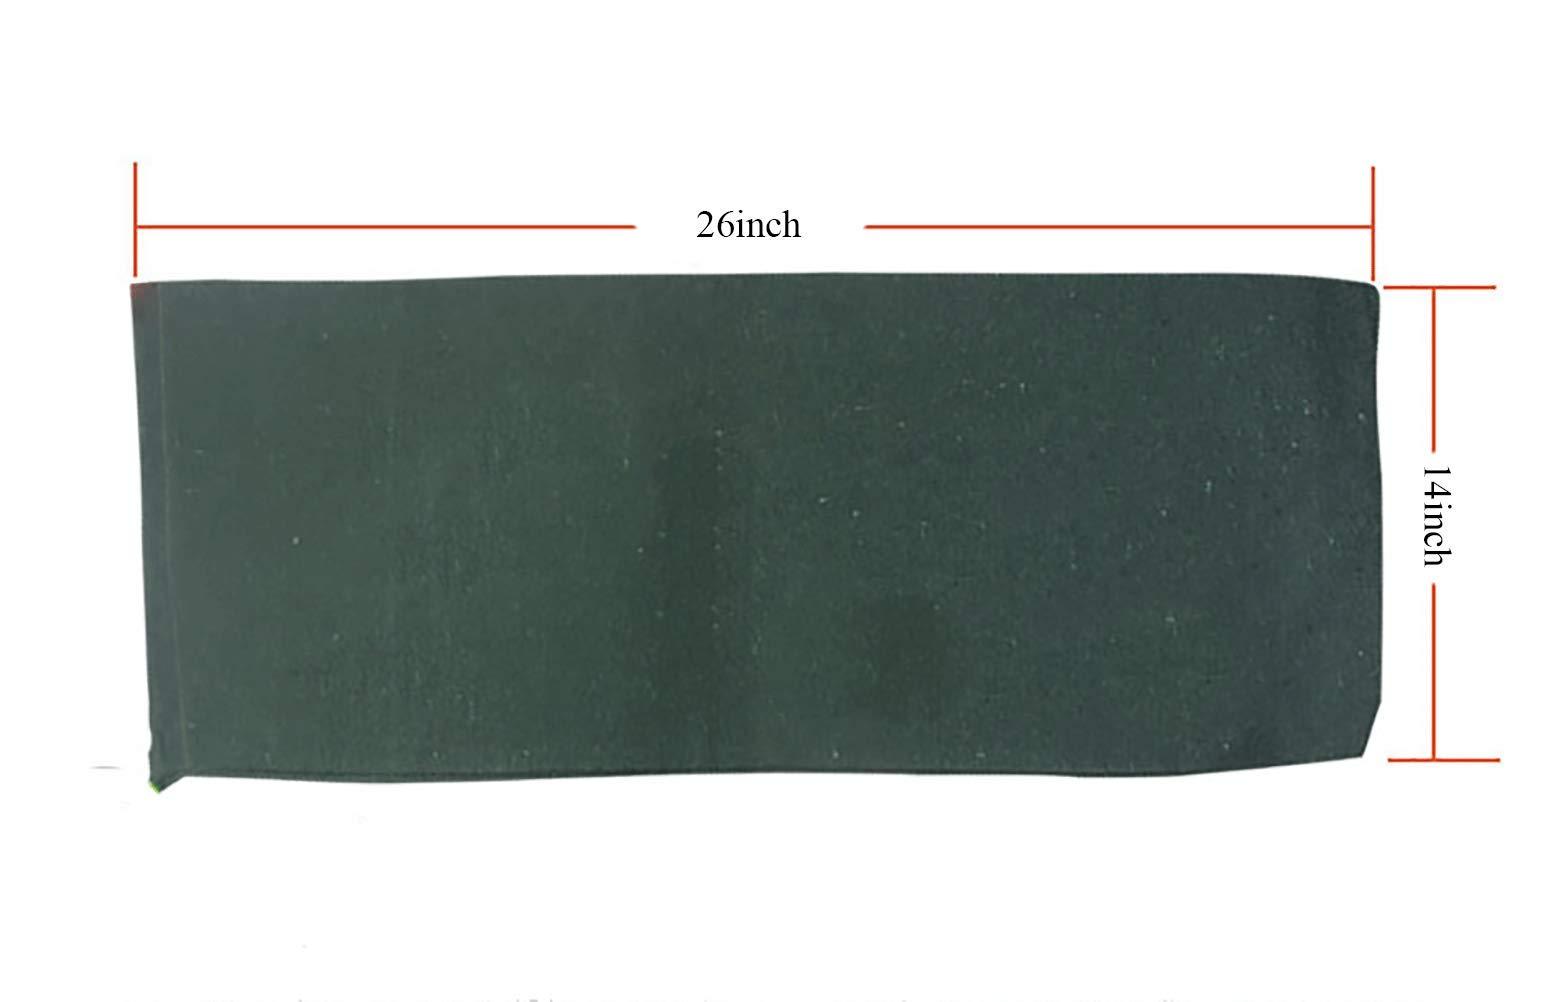 OriginA Empty Sandbag Flood Barrier Sand Bags for Flood Control, Eco-Friendly, 14x26in, 20 Pack, Green by OriginA (Image #4)